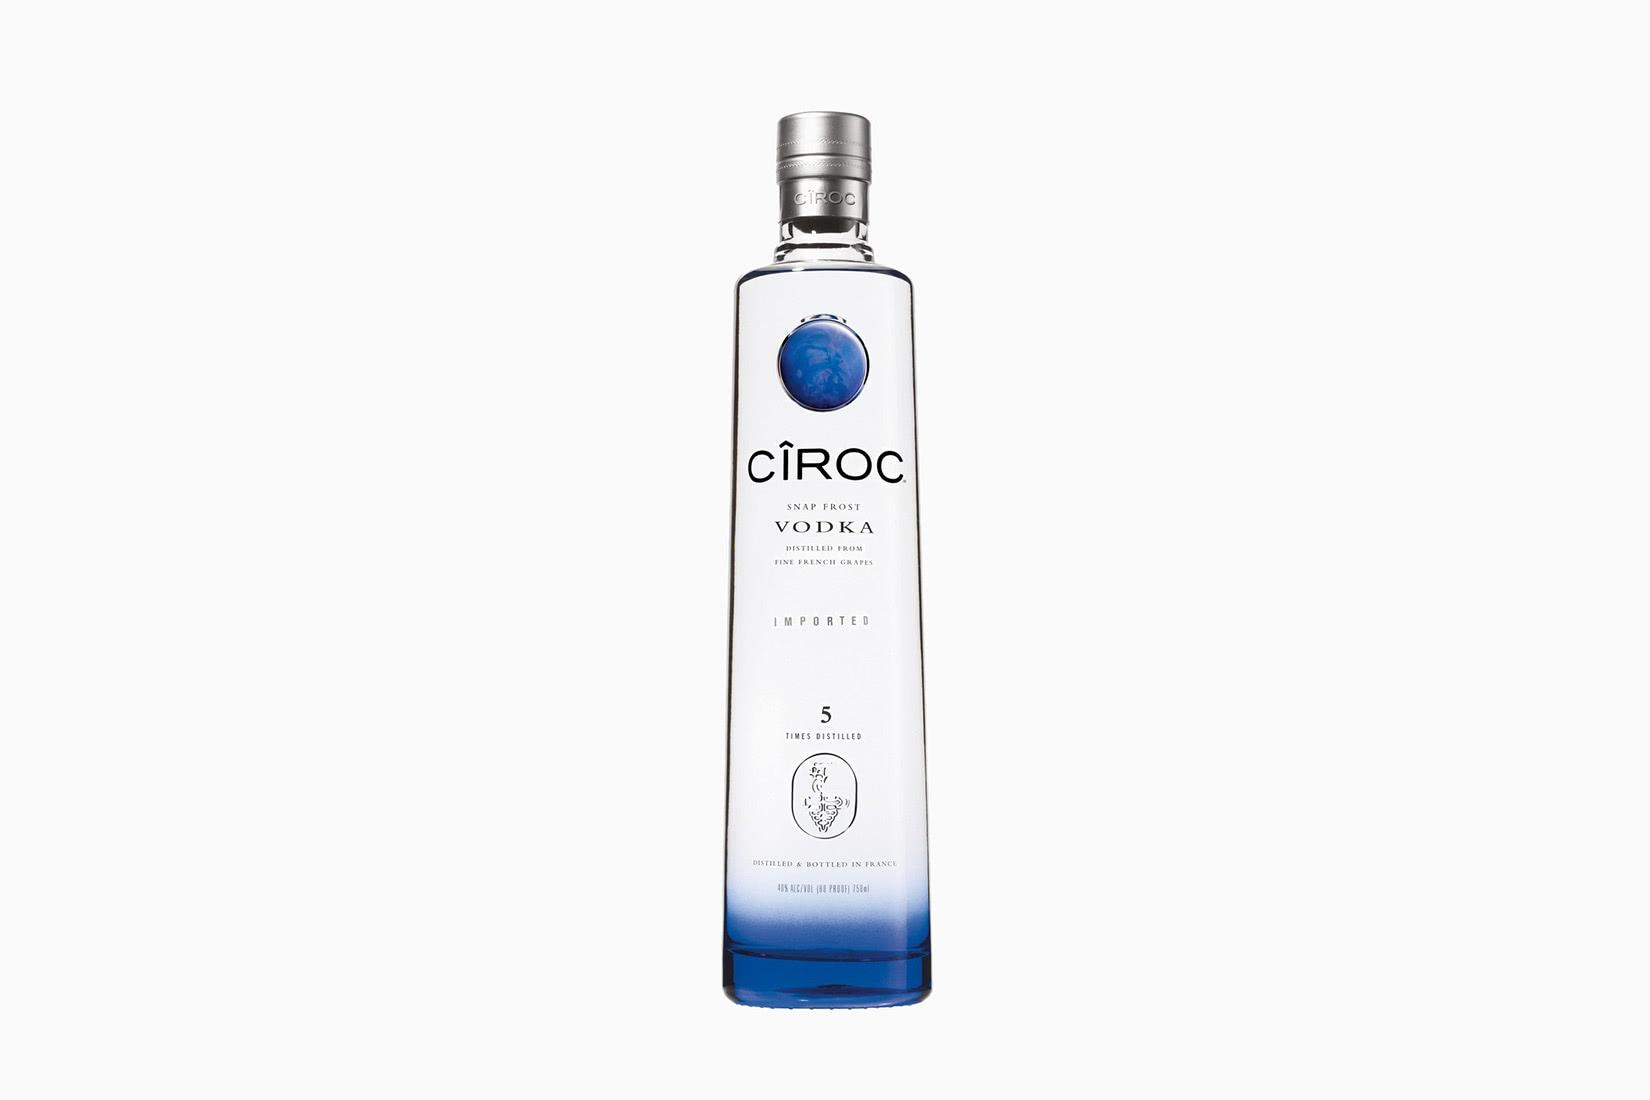 ciroc bottle price size vodka - Luxe Digital